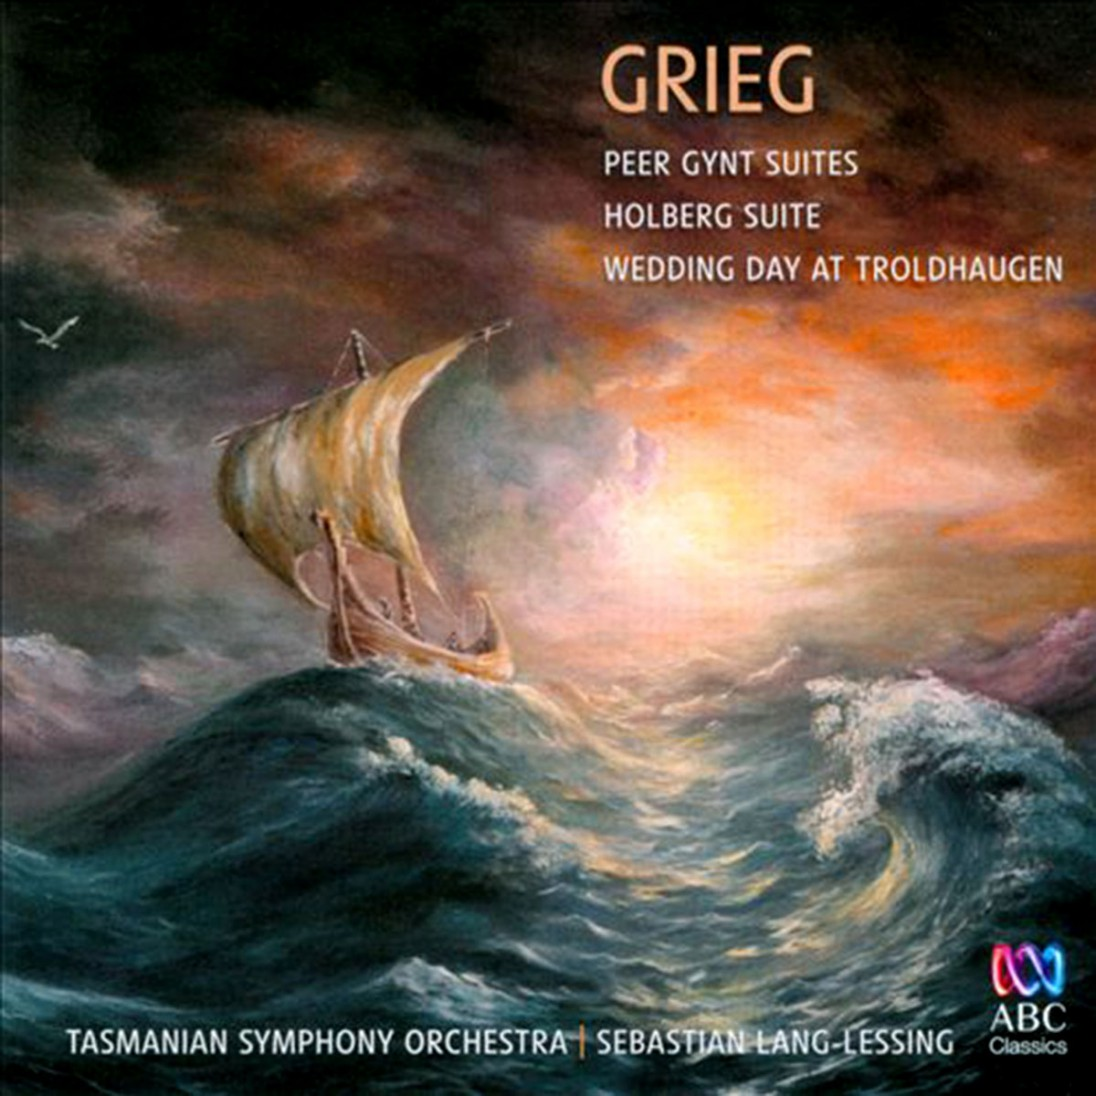 Grieg_Peer_Gynt_1_und_2_Holberg_Suite_Wedding_at_Troldhagen_Lang-Lessing